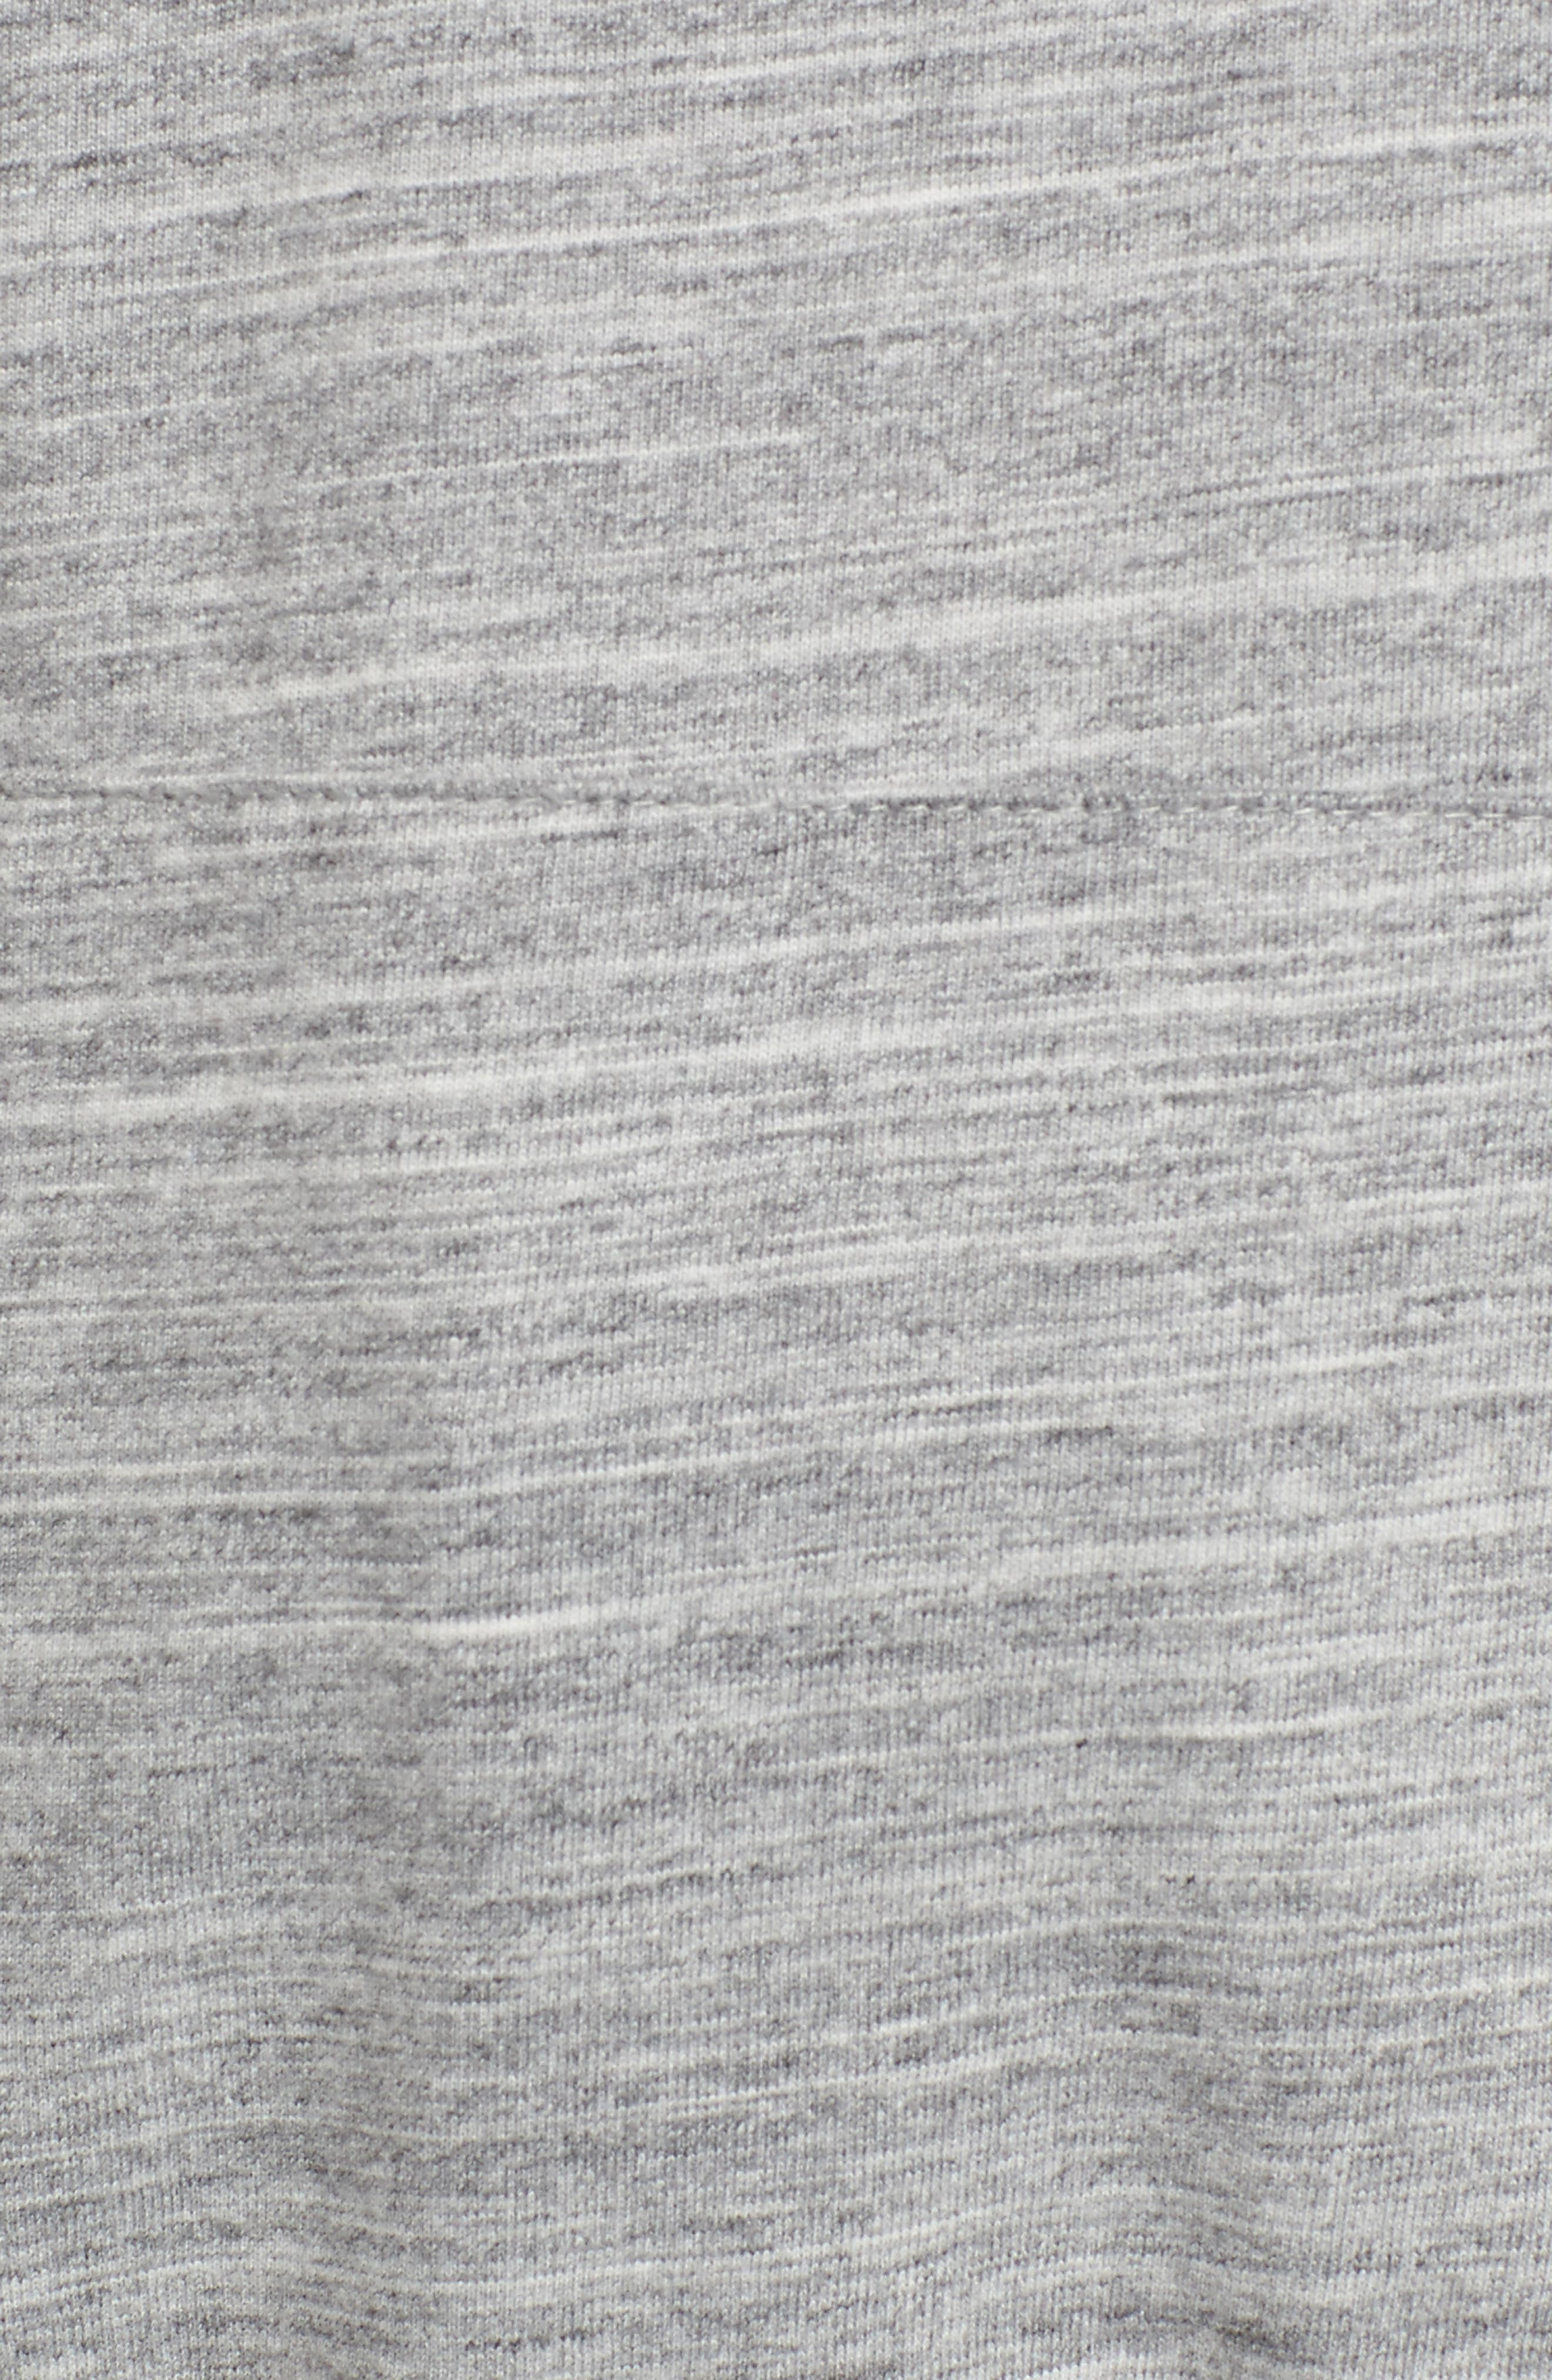 Revolve - Seattle Seahawks Hoodie,                             Alternate thumbnail 5, color,                             Space Dye Grey